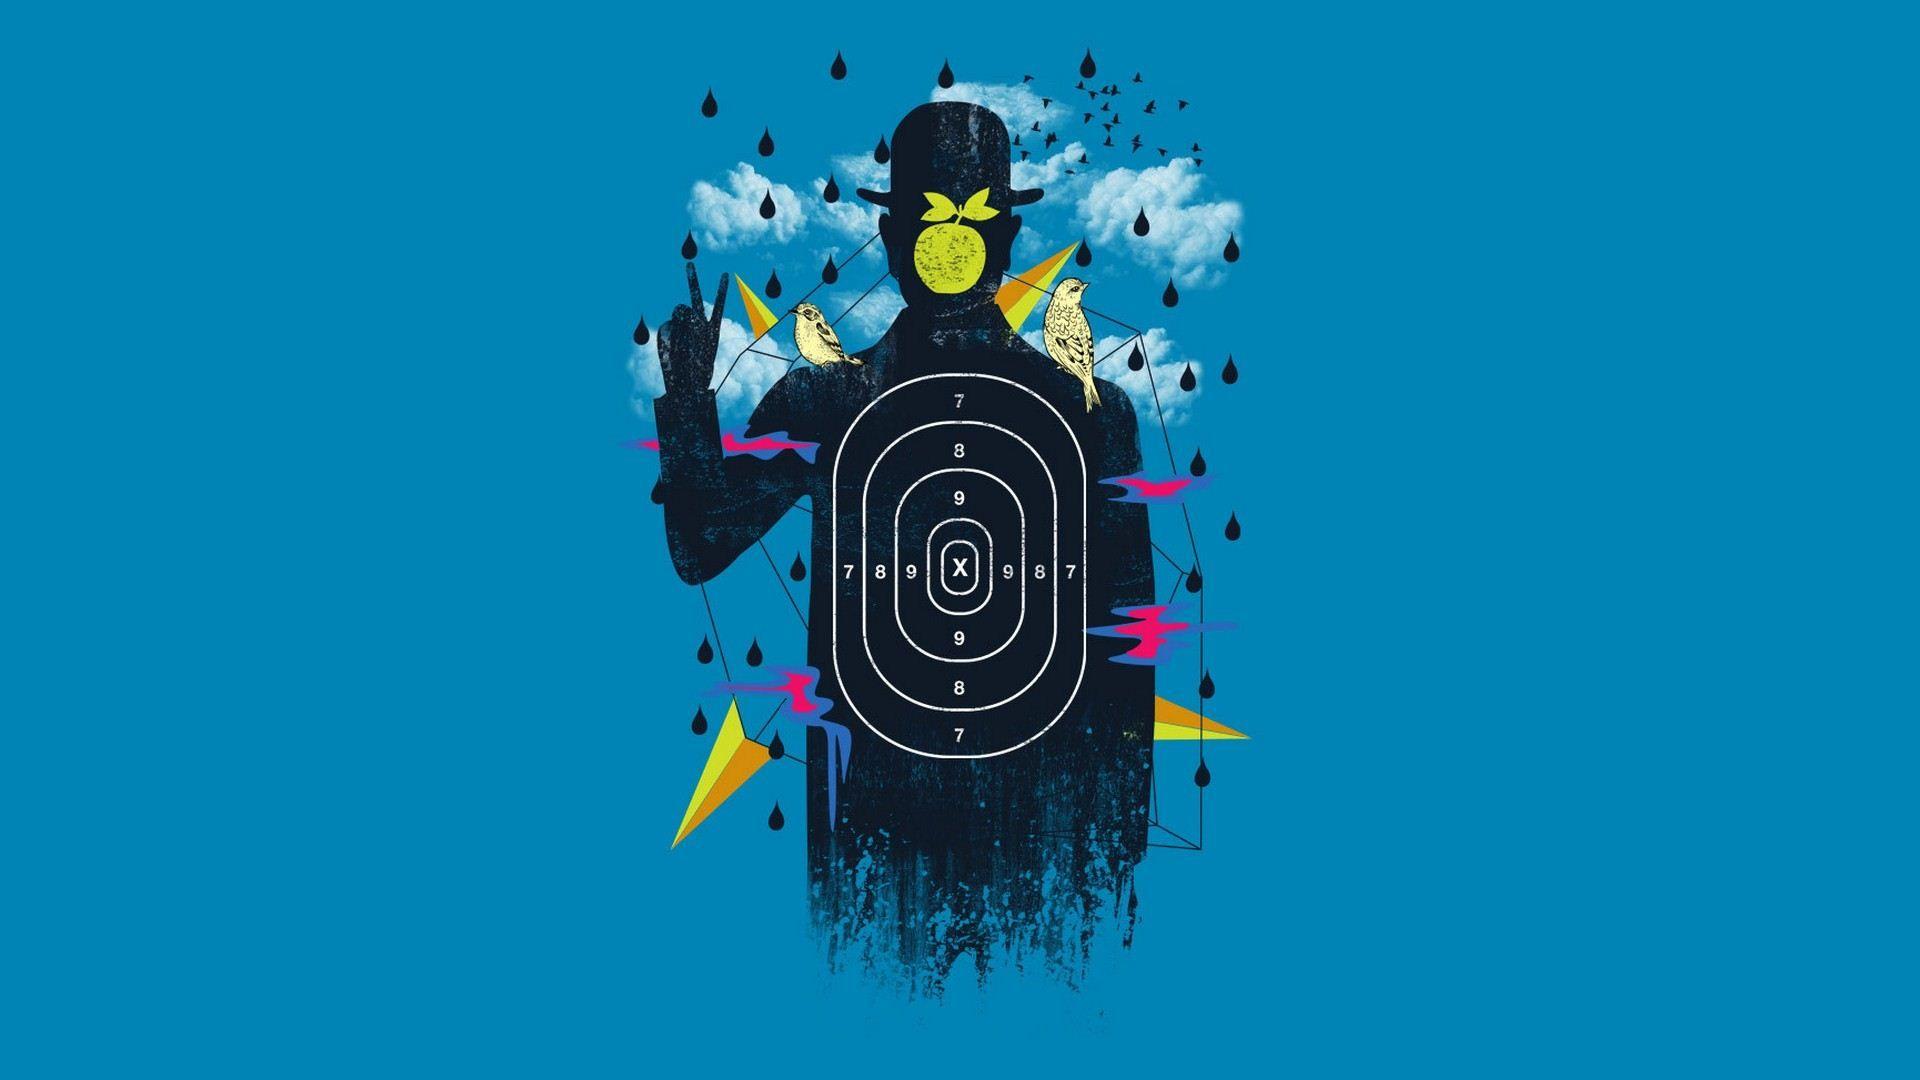 Shooting Target Target Wallpaper Wallpaper Peel And Stick Wallpaper